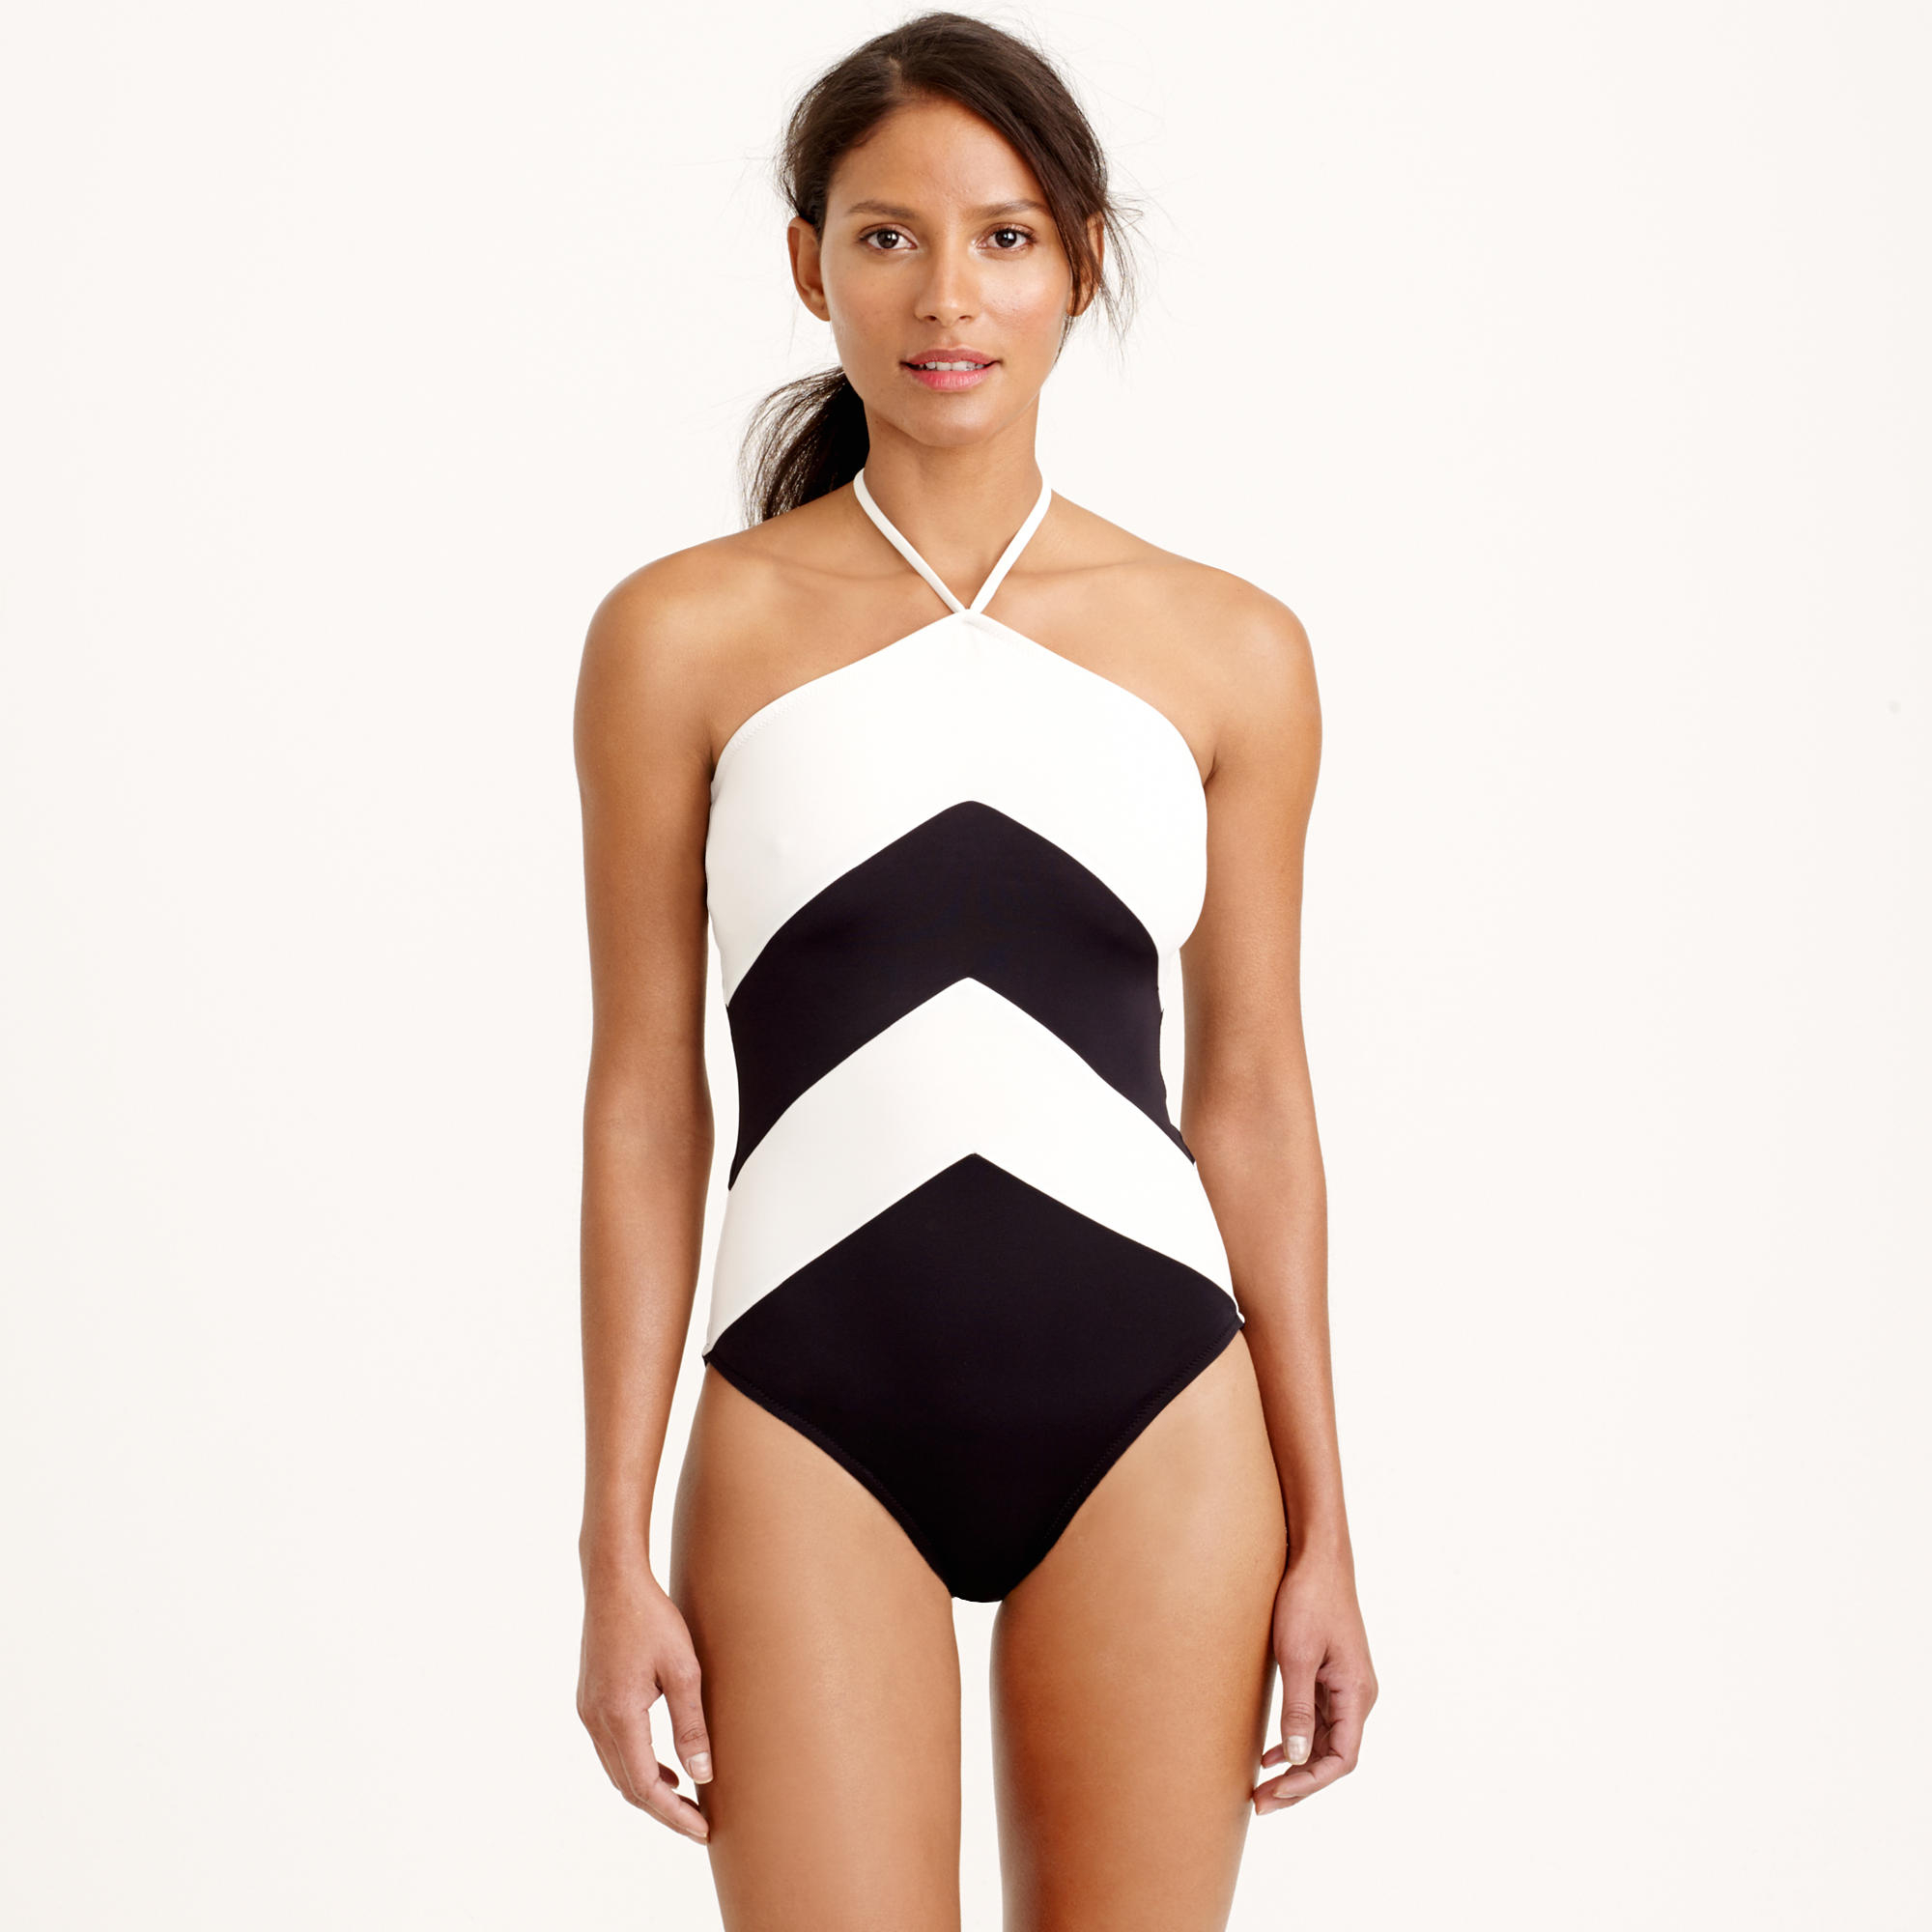 c3ea07fafb3 ... Gallery CIDEARY One Piece Swimsuits Black High Cut Monokini Halter ...